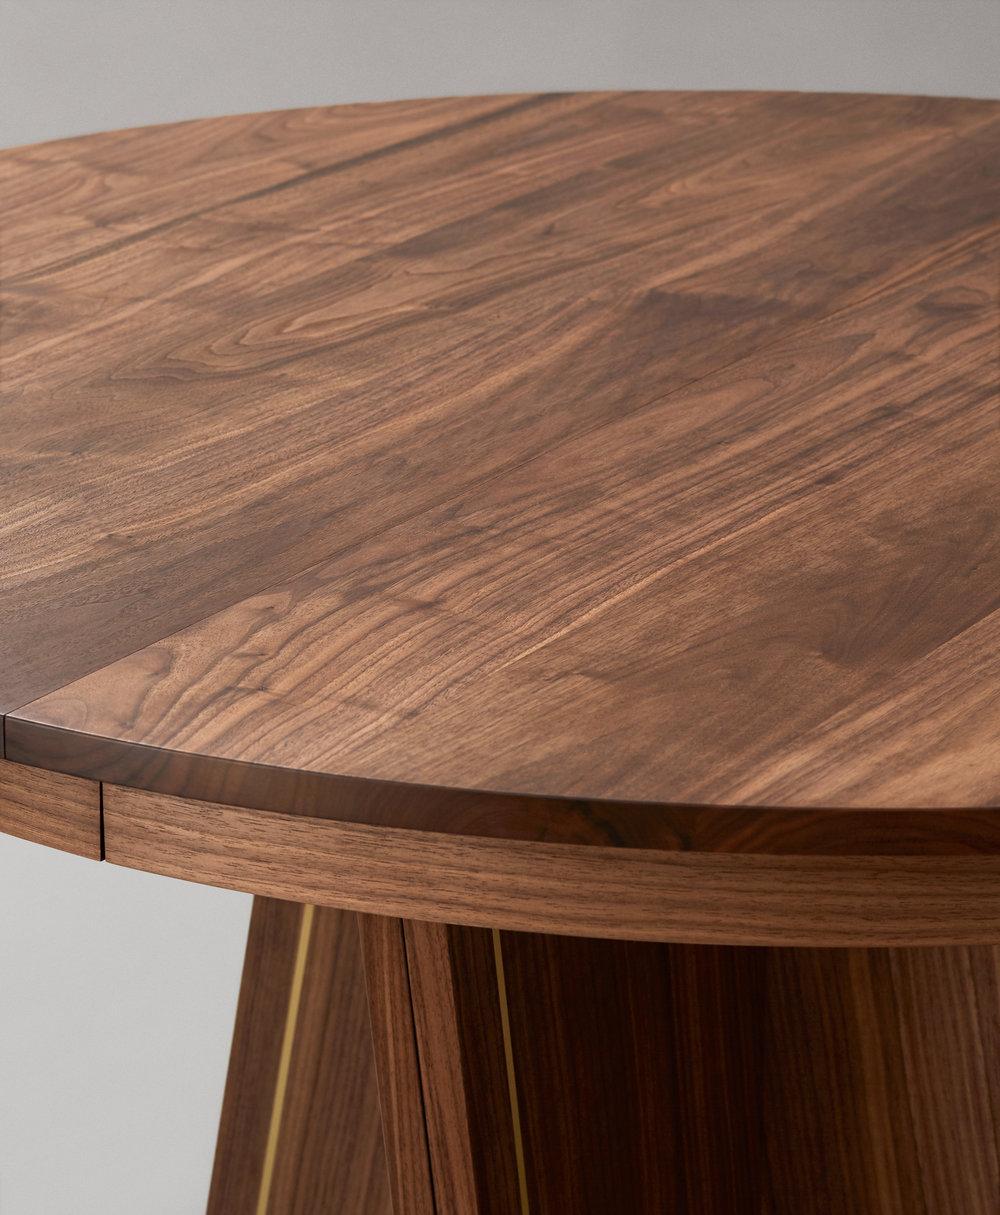 JamieHerman-Table_10.jpg